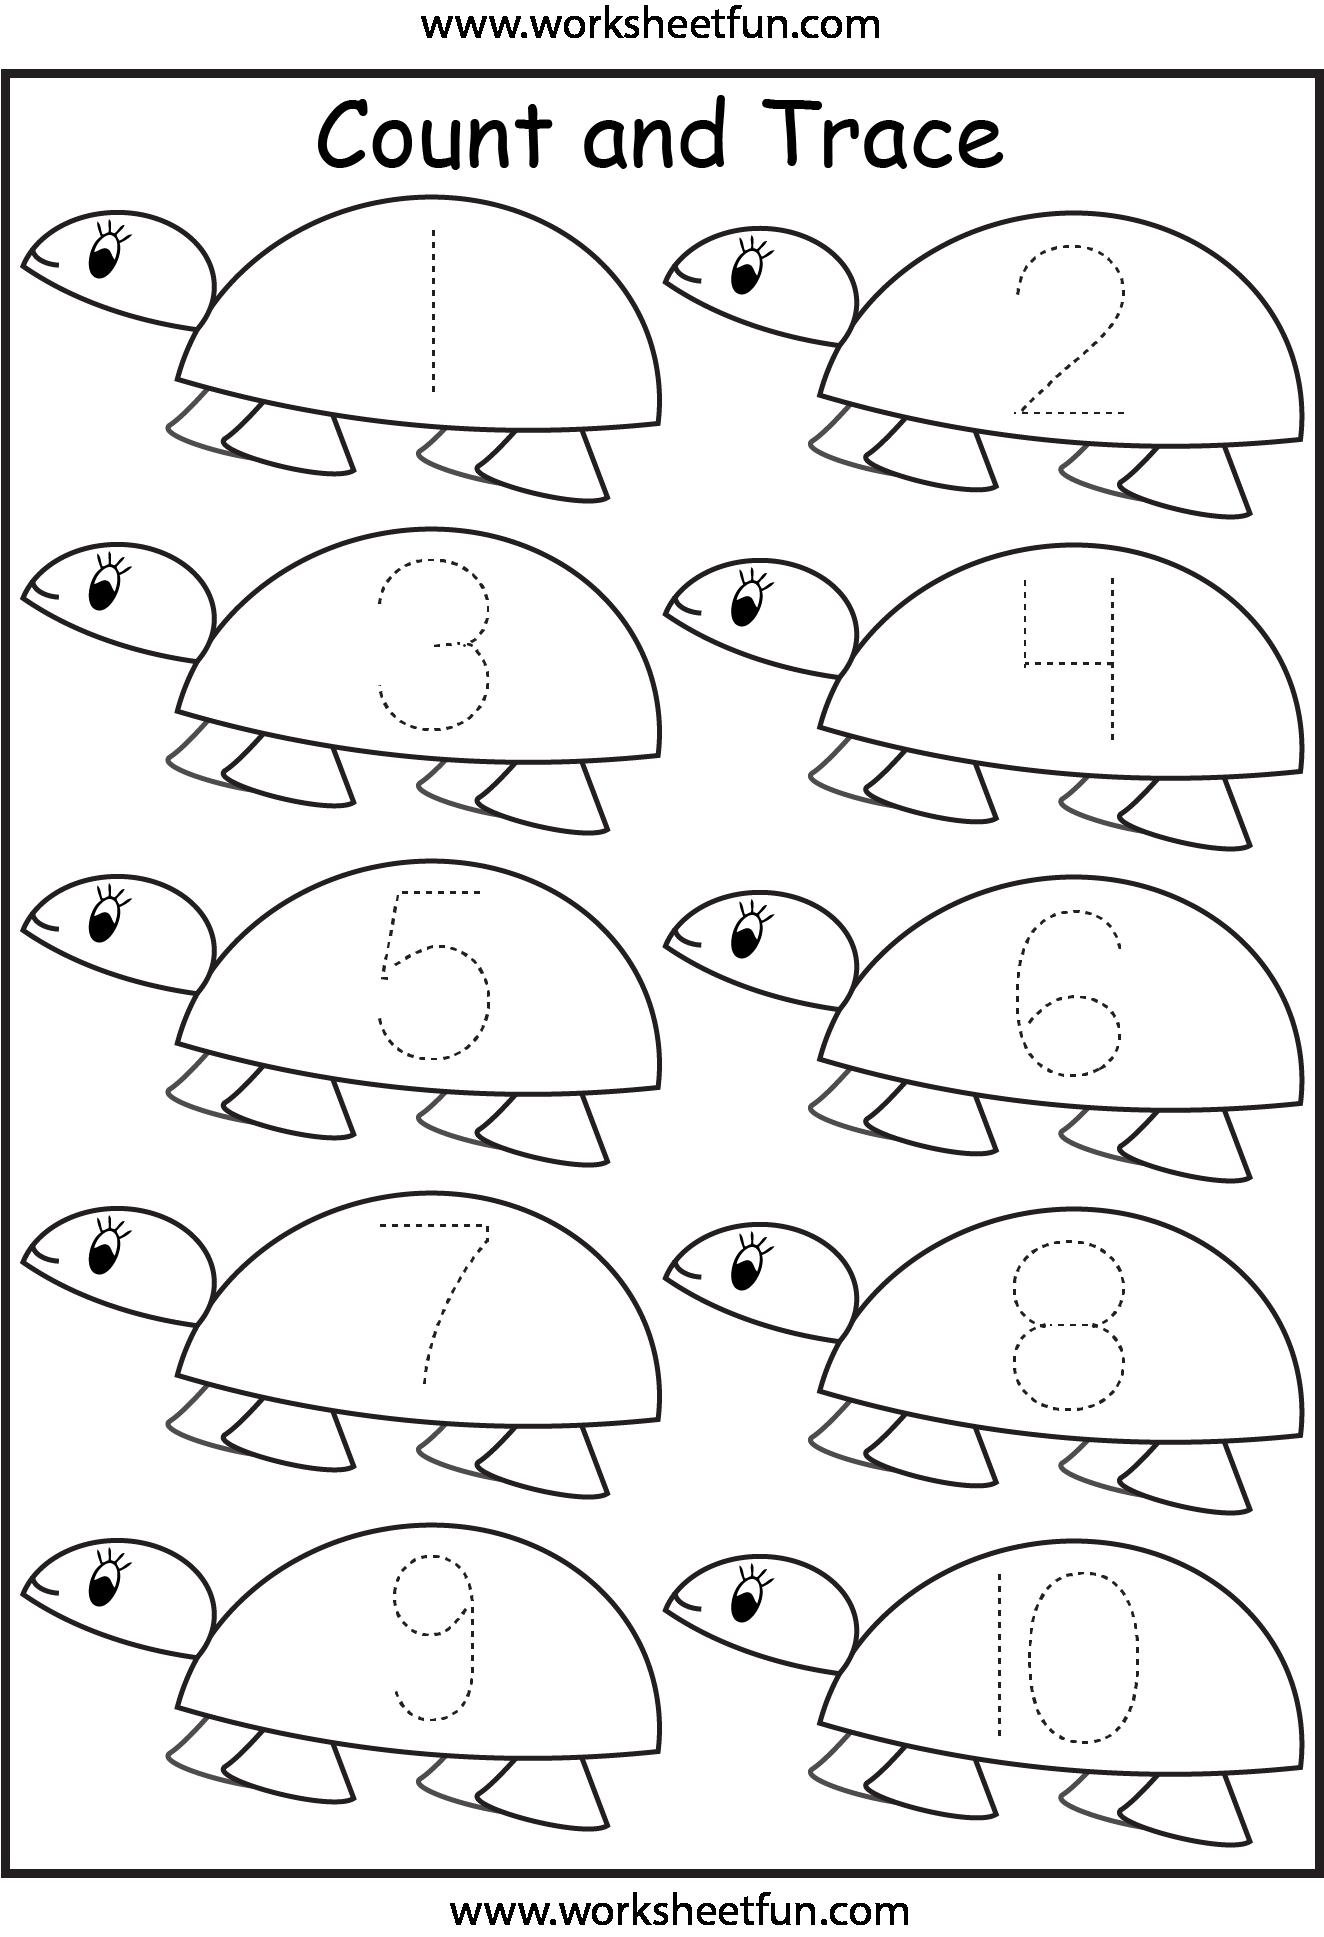 7 Best Images of Free Printable Worksheets Numbers 1-10 ...